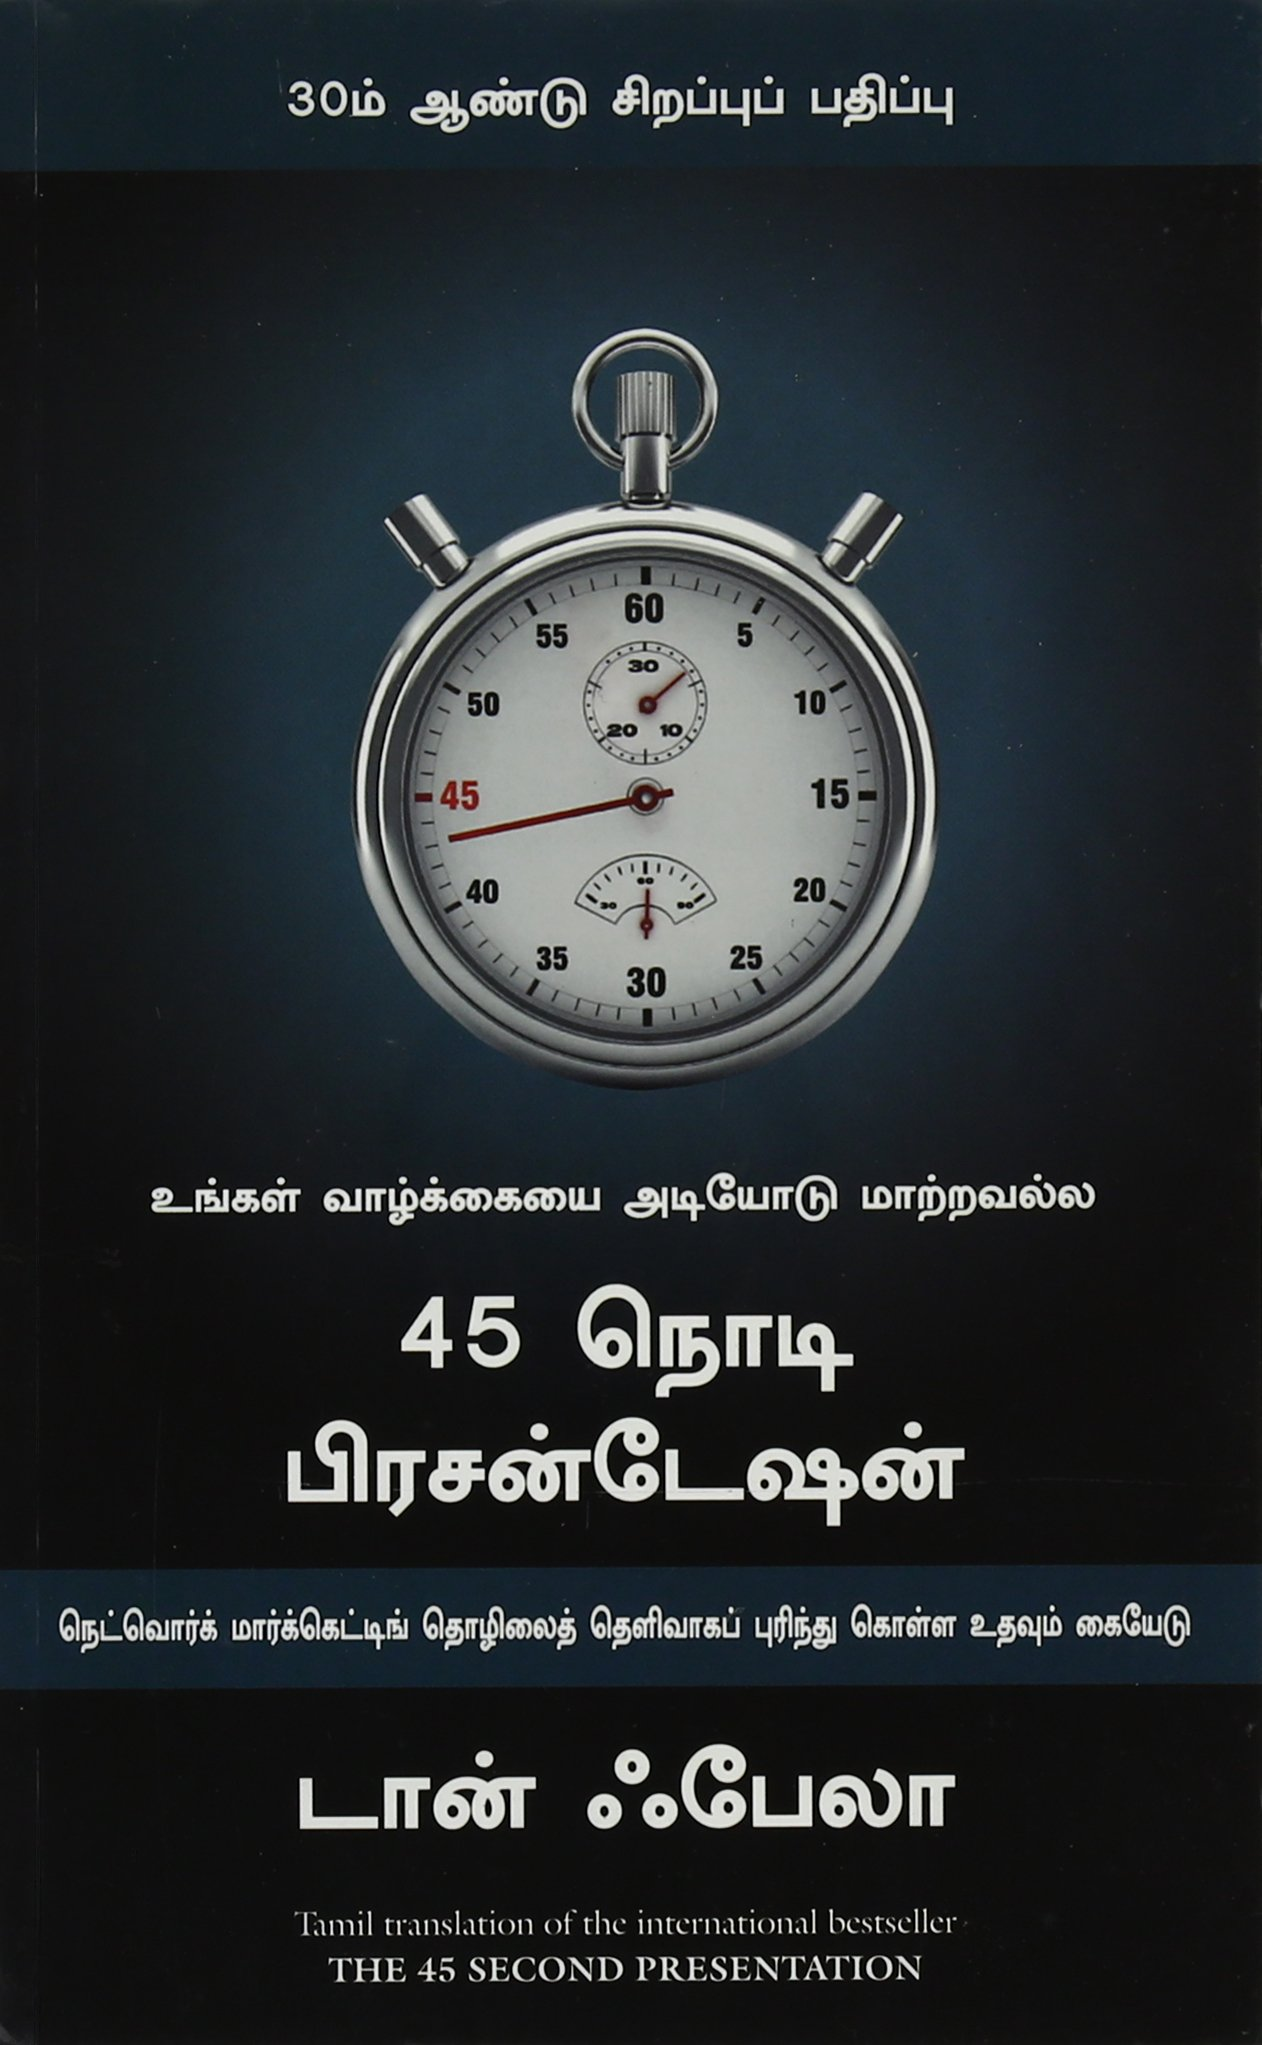 THE 45 SECOND PRESENTATION - Tamil - உன் வாழ்க்கையை அடியோடு மாற்றவல்ல 45 நொடி பிரசன்டேஷன்